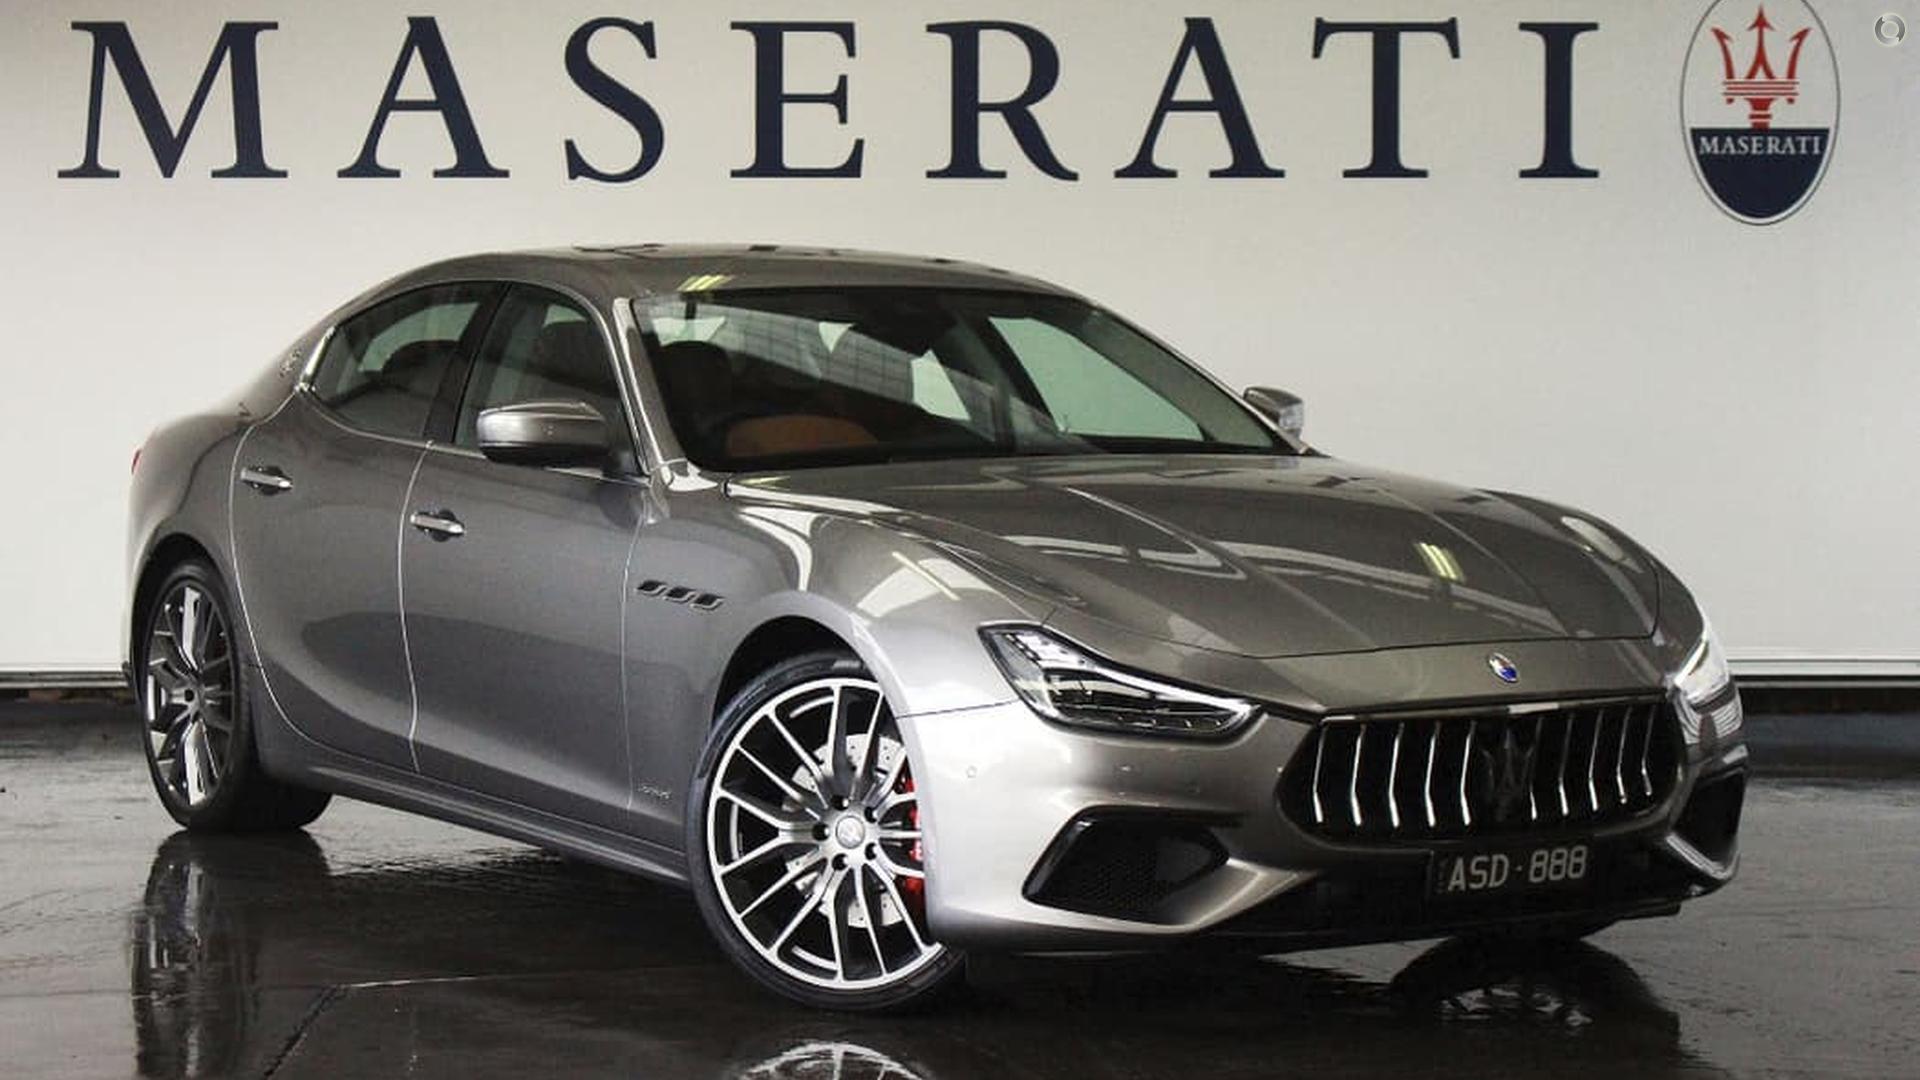 2018 Maserati Ghibli GranSport M157